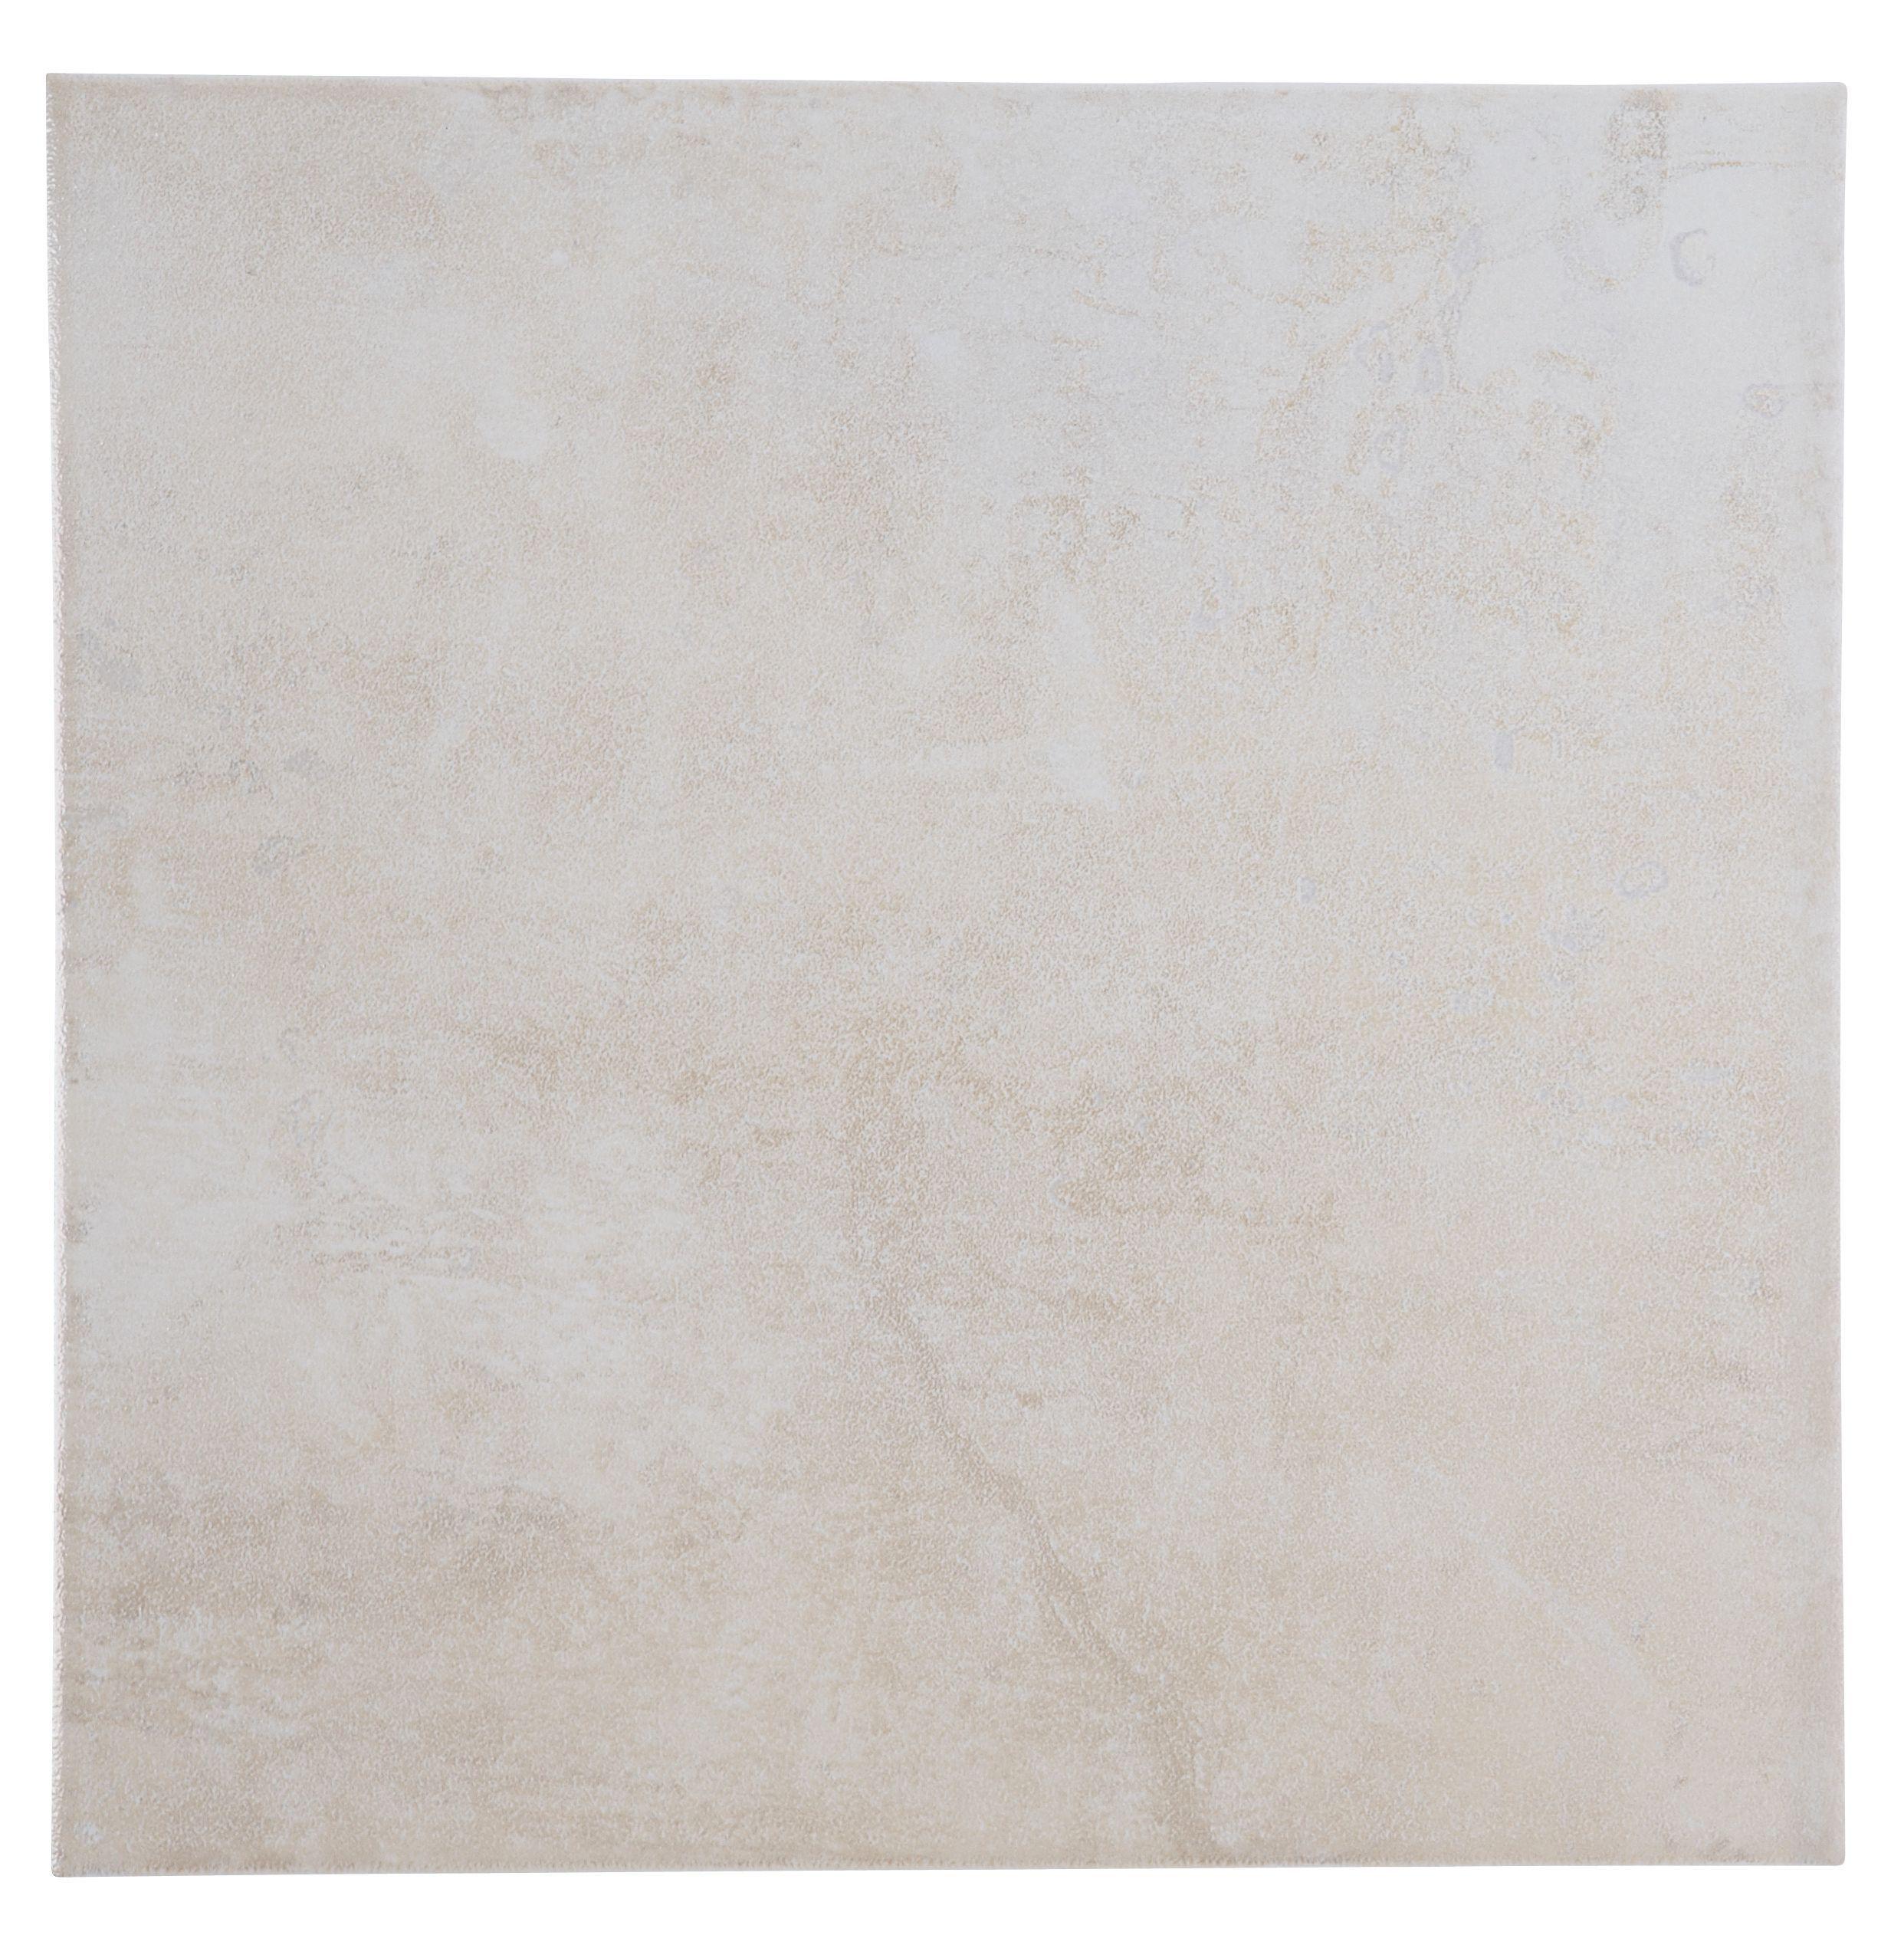 Natural Travertine Mosaic Tile L 300mm W 300mm: Metallic Cream Porcelain Floor Tile, Pack Of 16, (L)300mm